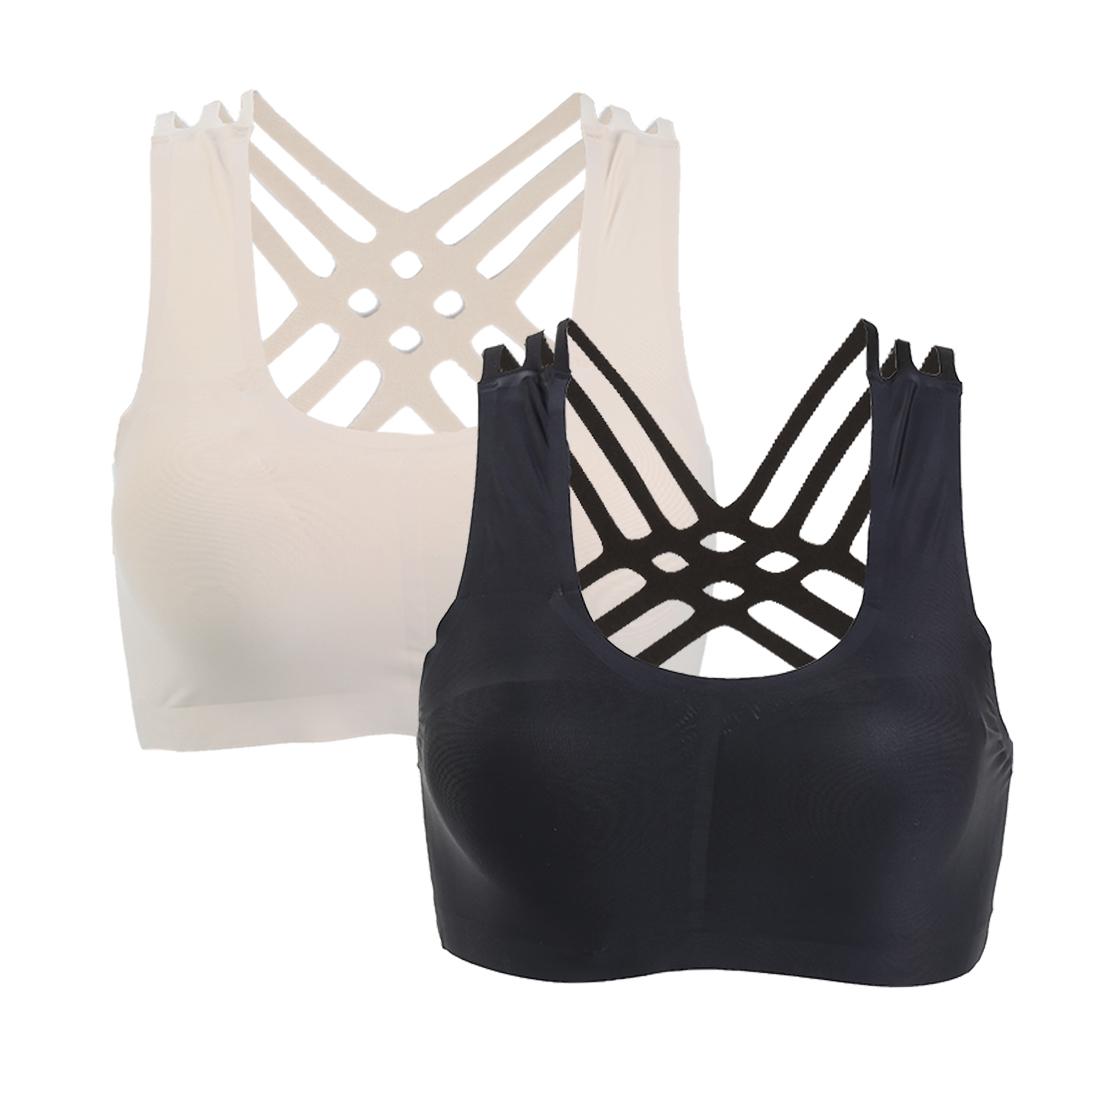 Women 2 Pack Ice Silk Wirefree Cross Back Yoga Sports Bra Large Black+Beige